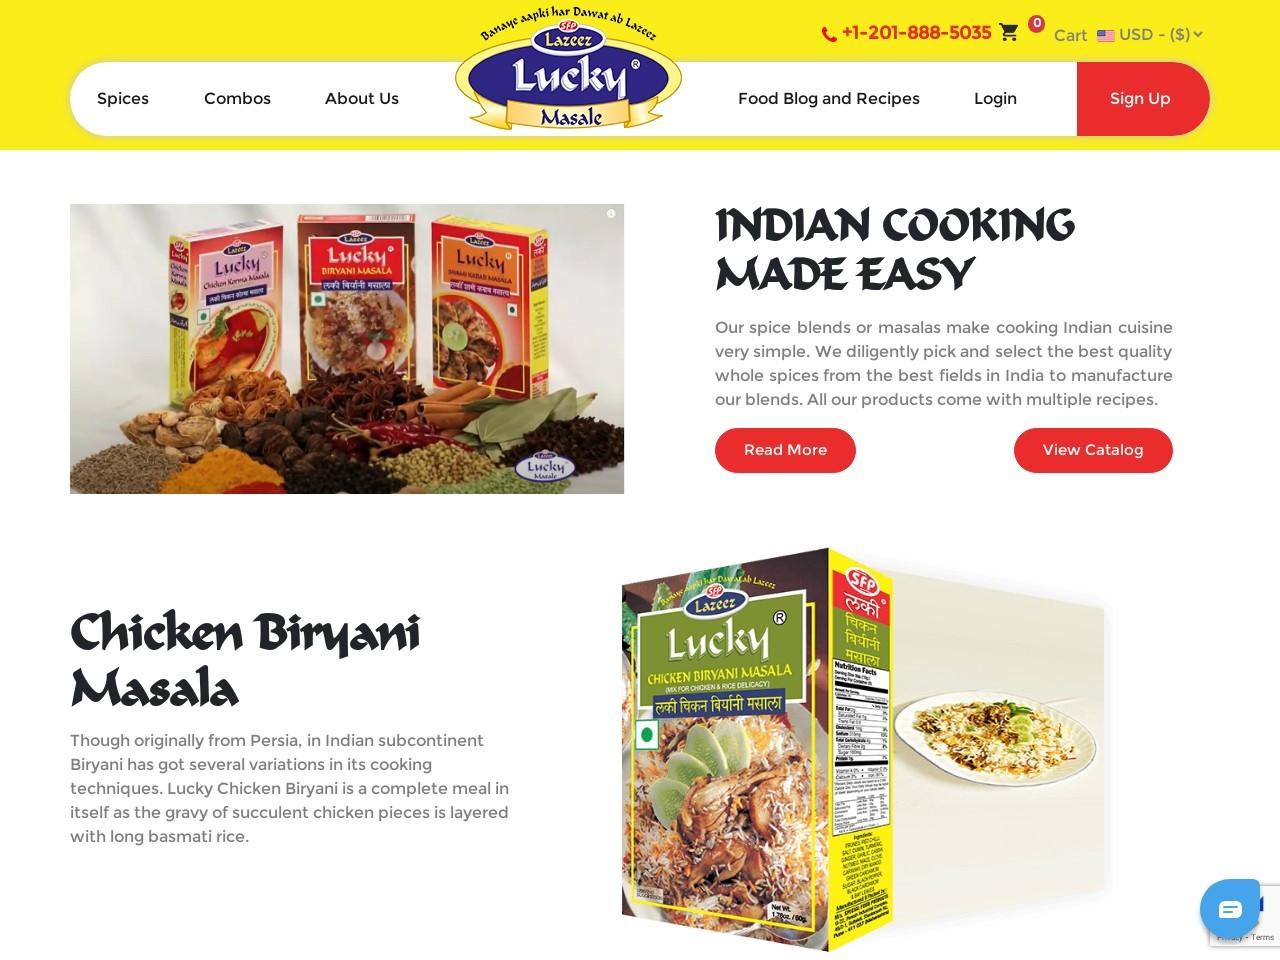 Chicken Angara Masala – Lucky Masale